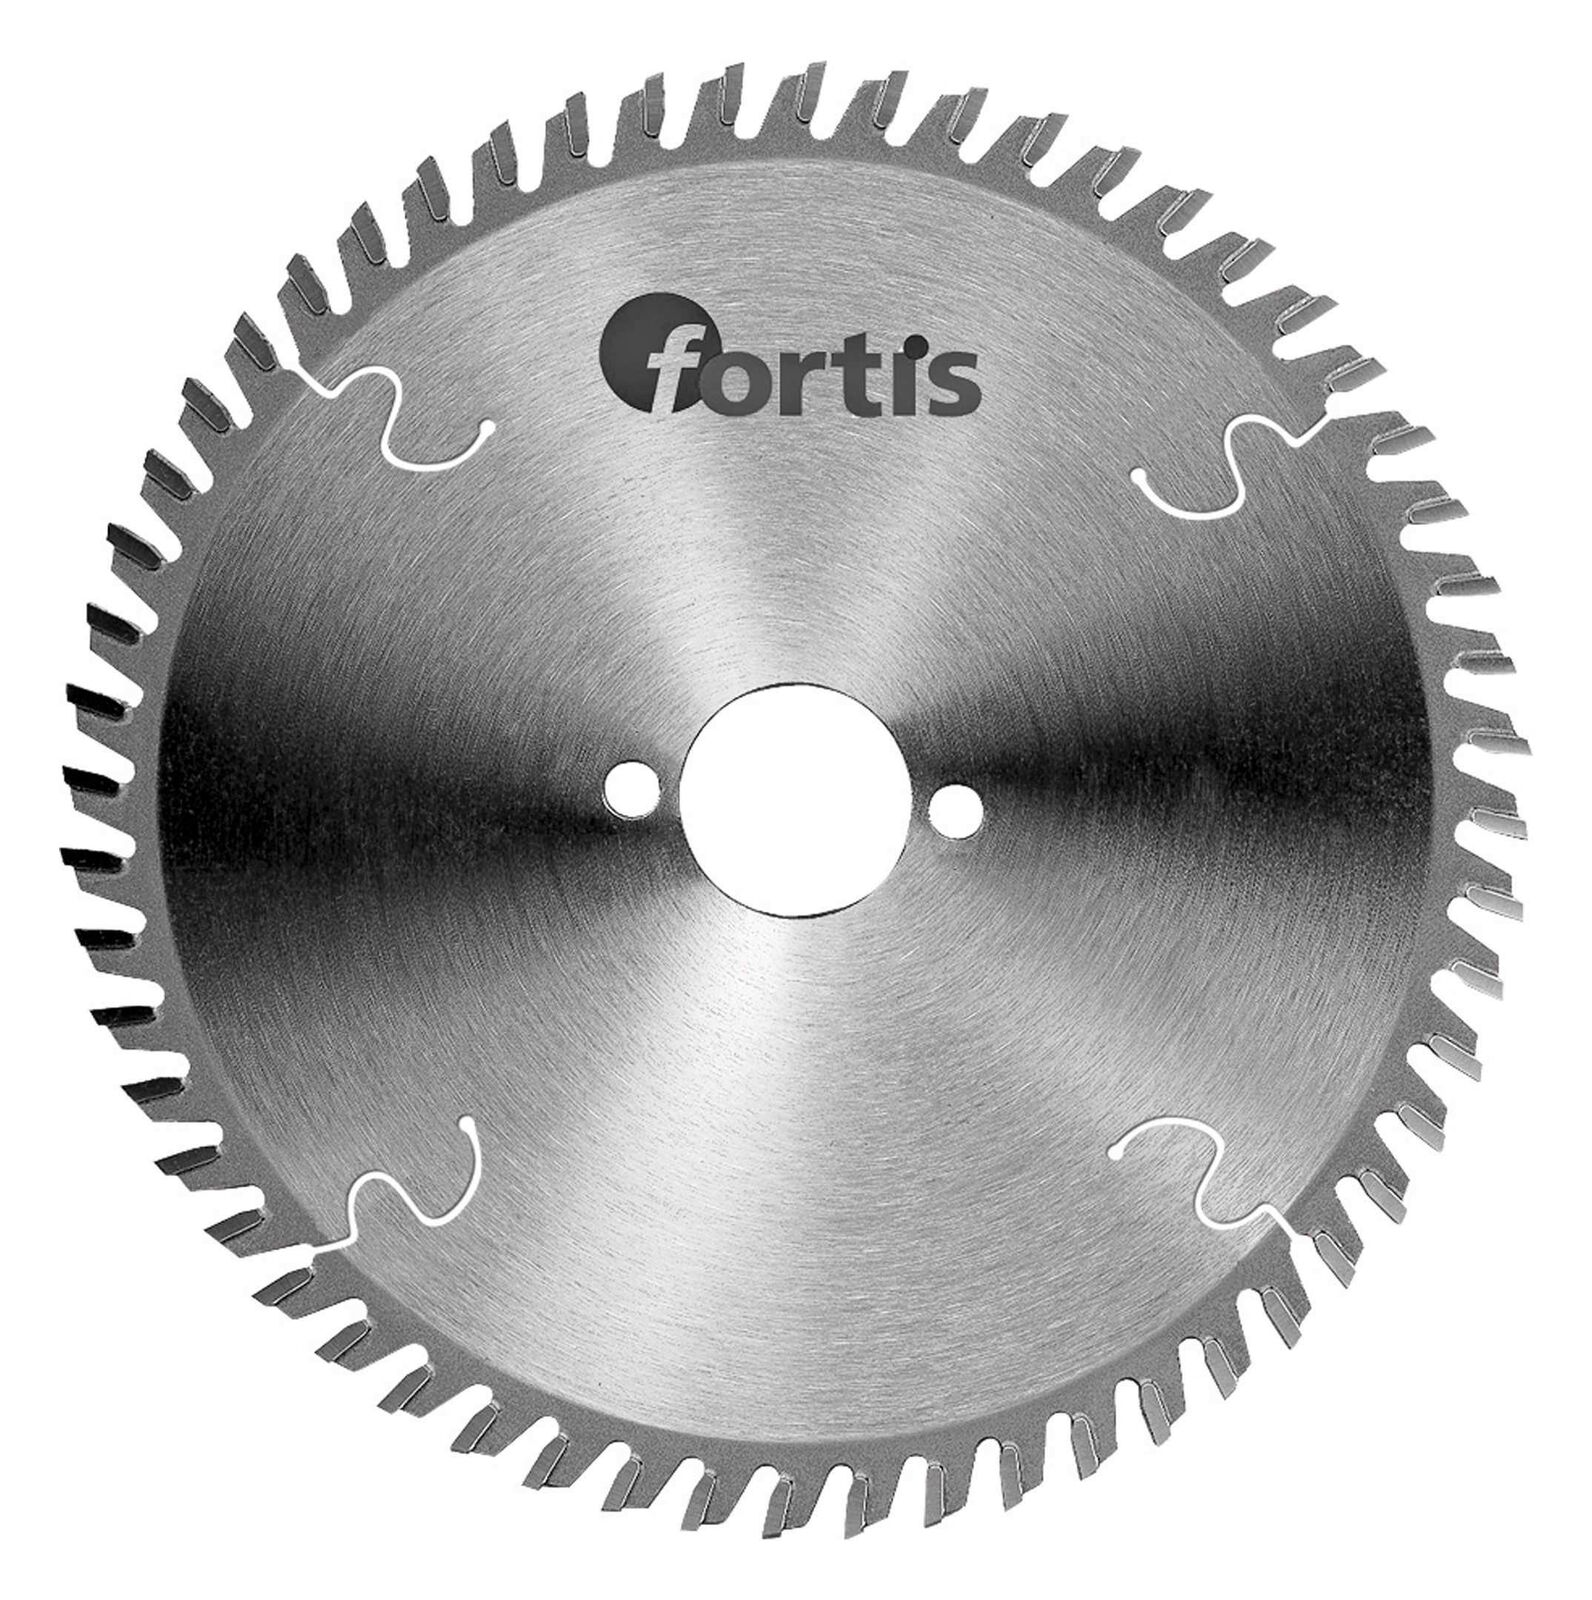 Fortis HW-Kreissägeblatt 216 x 3,0 x 30mm Z64 W negativ